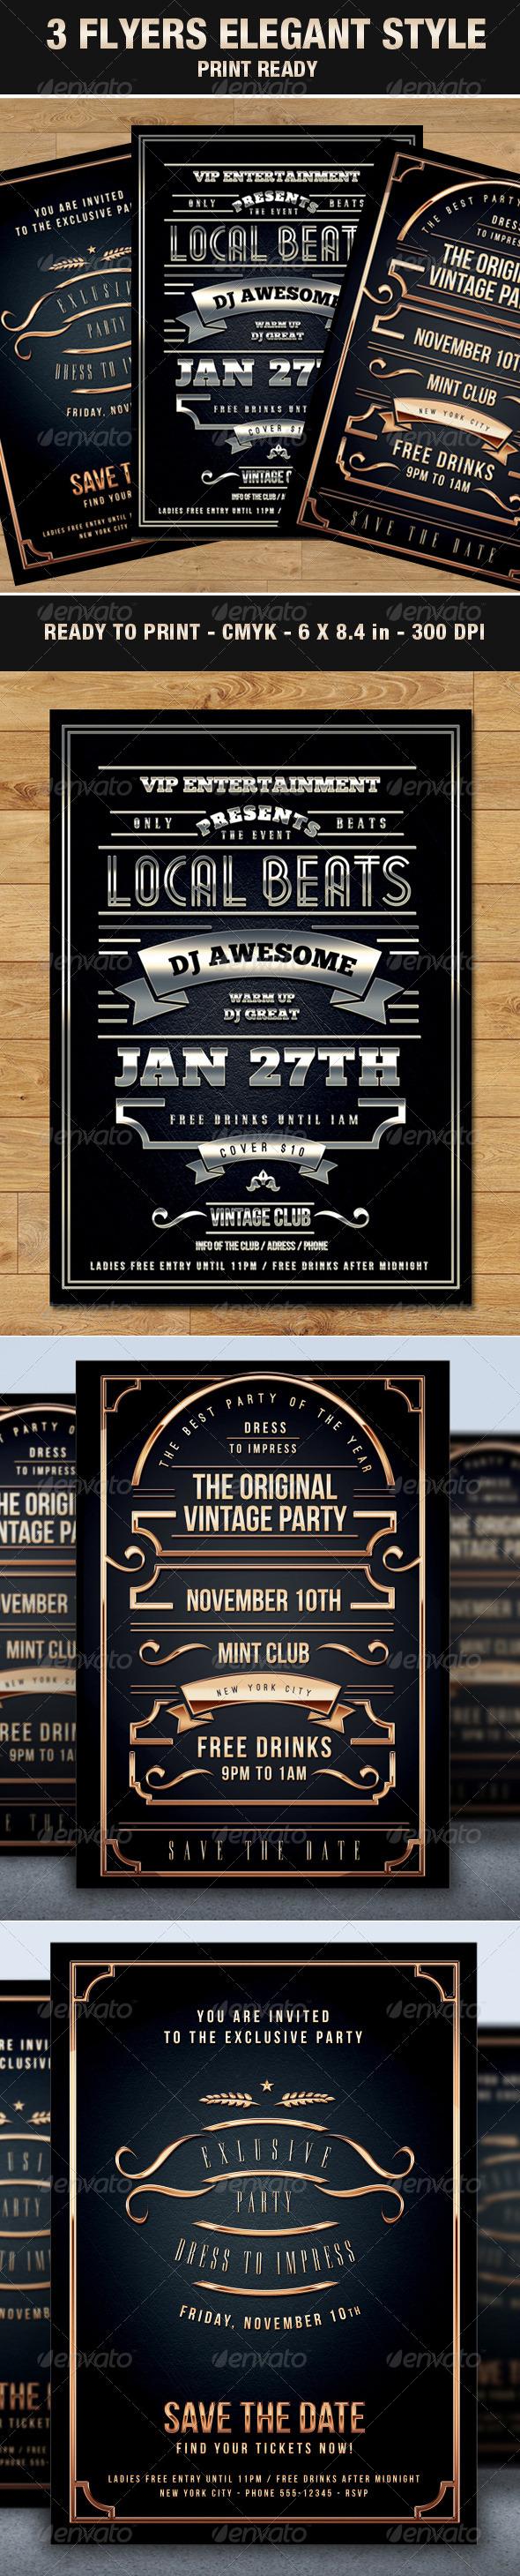 3 Flyers Elegant & Vip Style Vintage Typography - Events Flyers